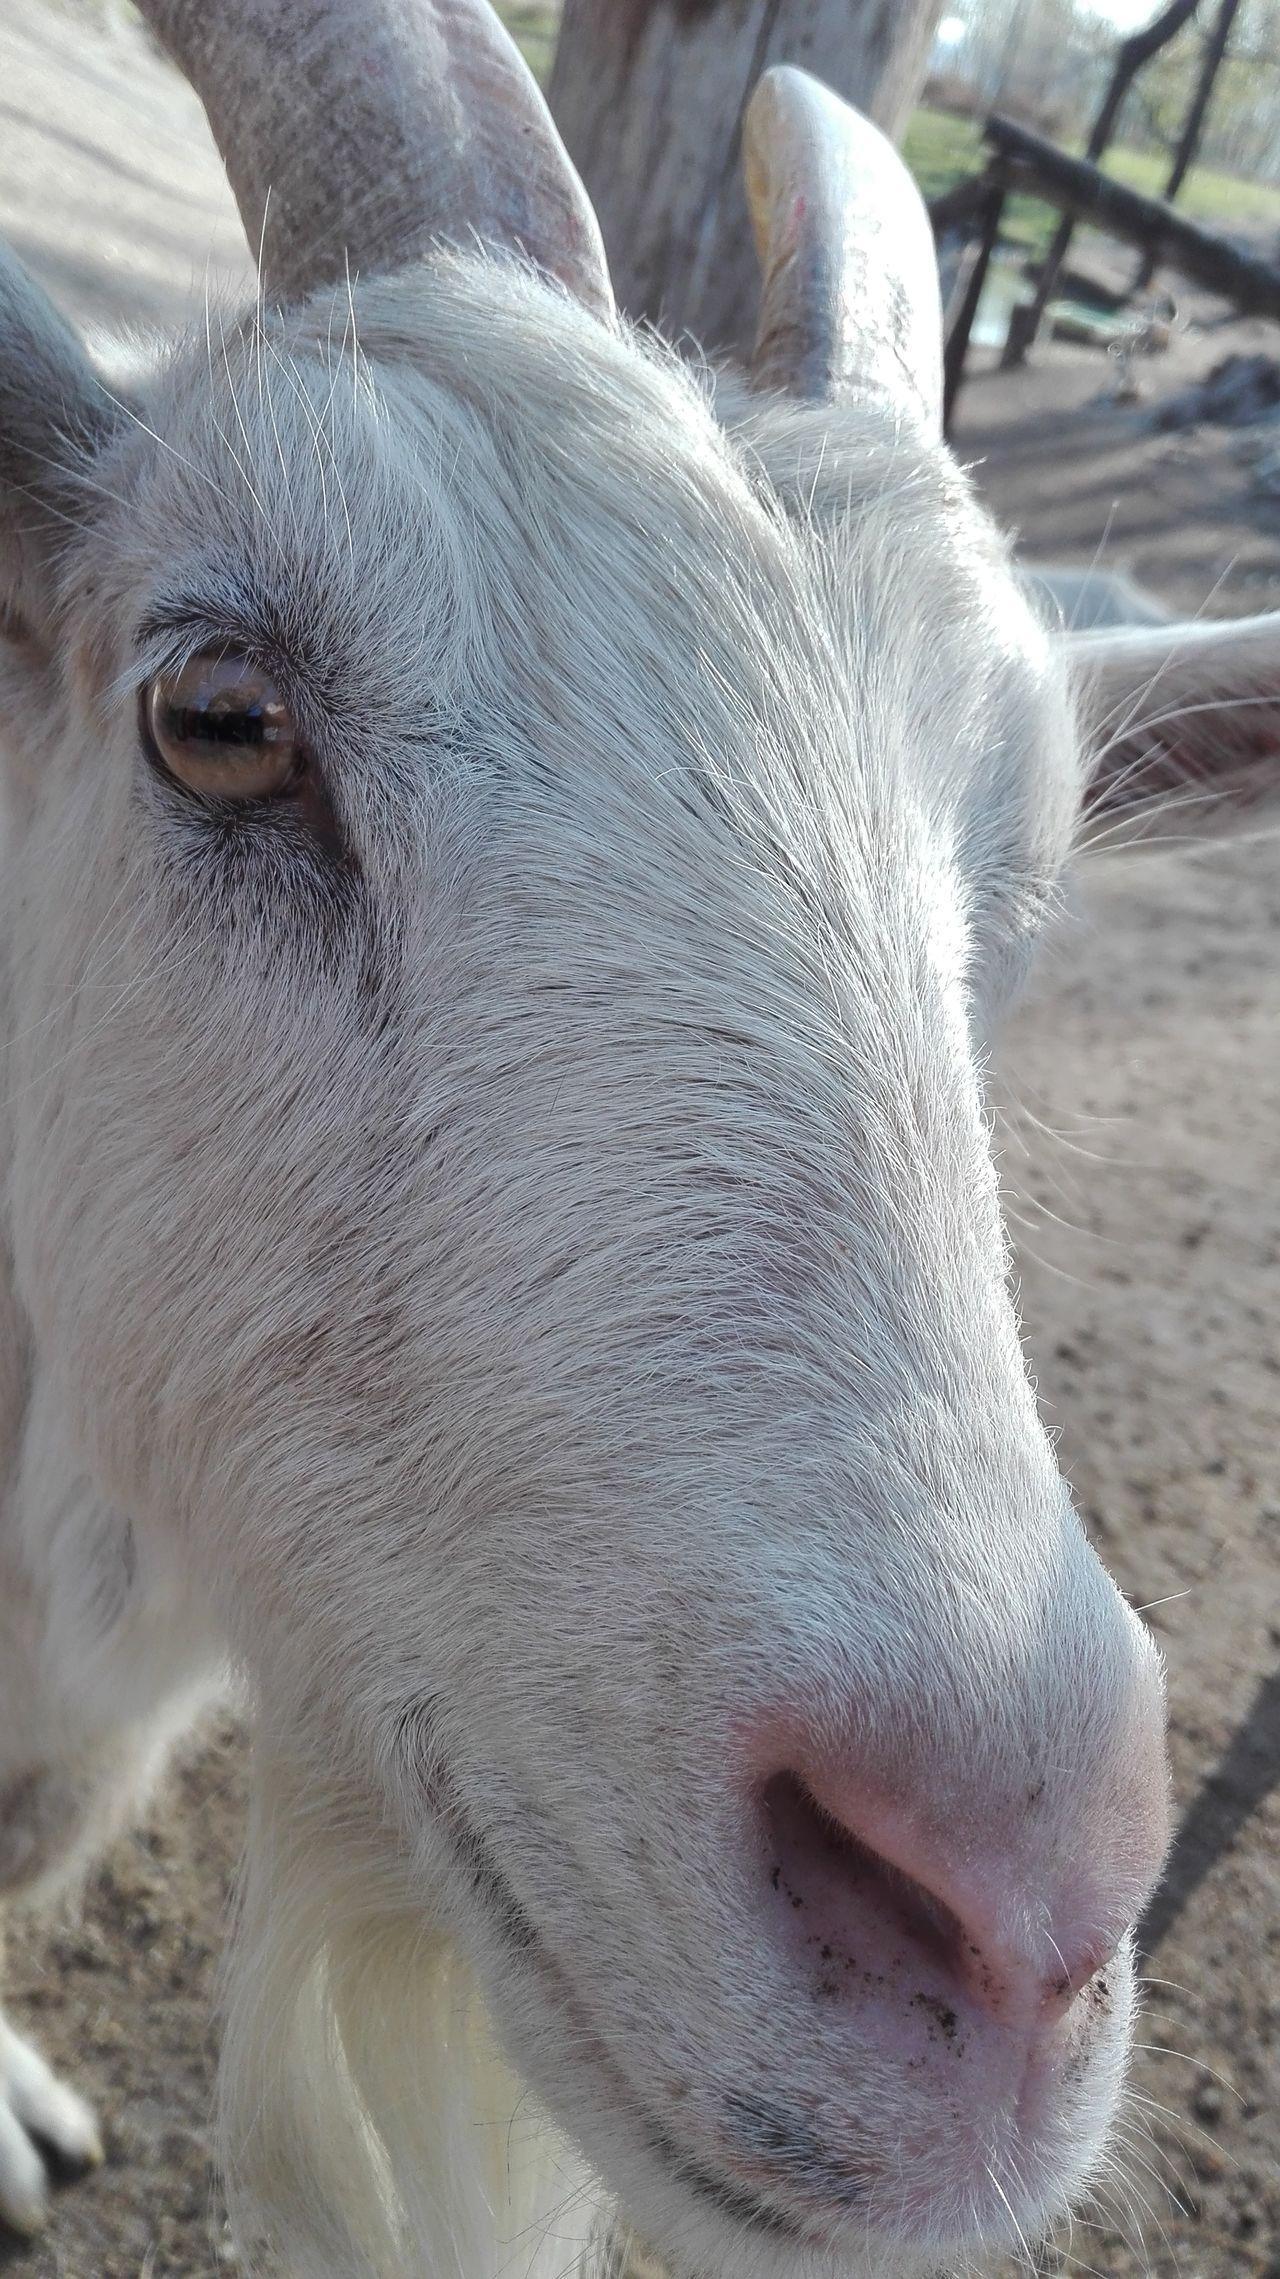 Goat Goatfarm Goat Farm Goat Head Goathead White Goat